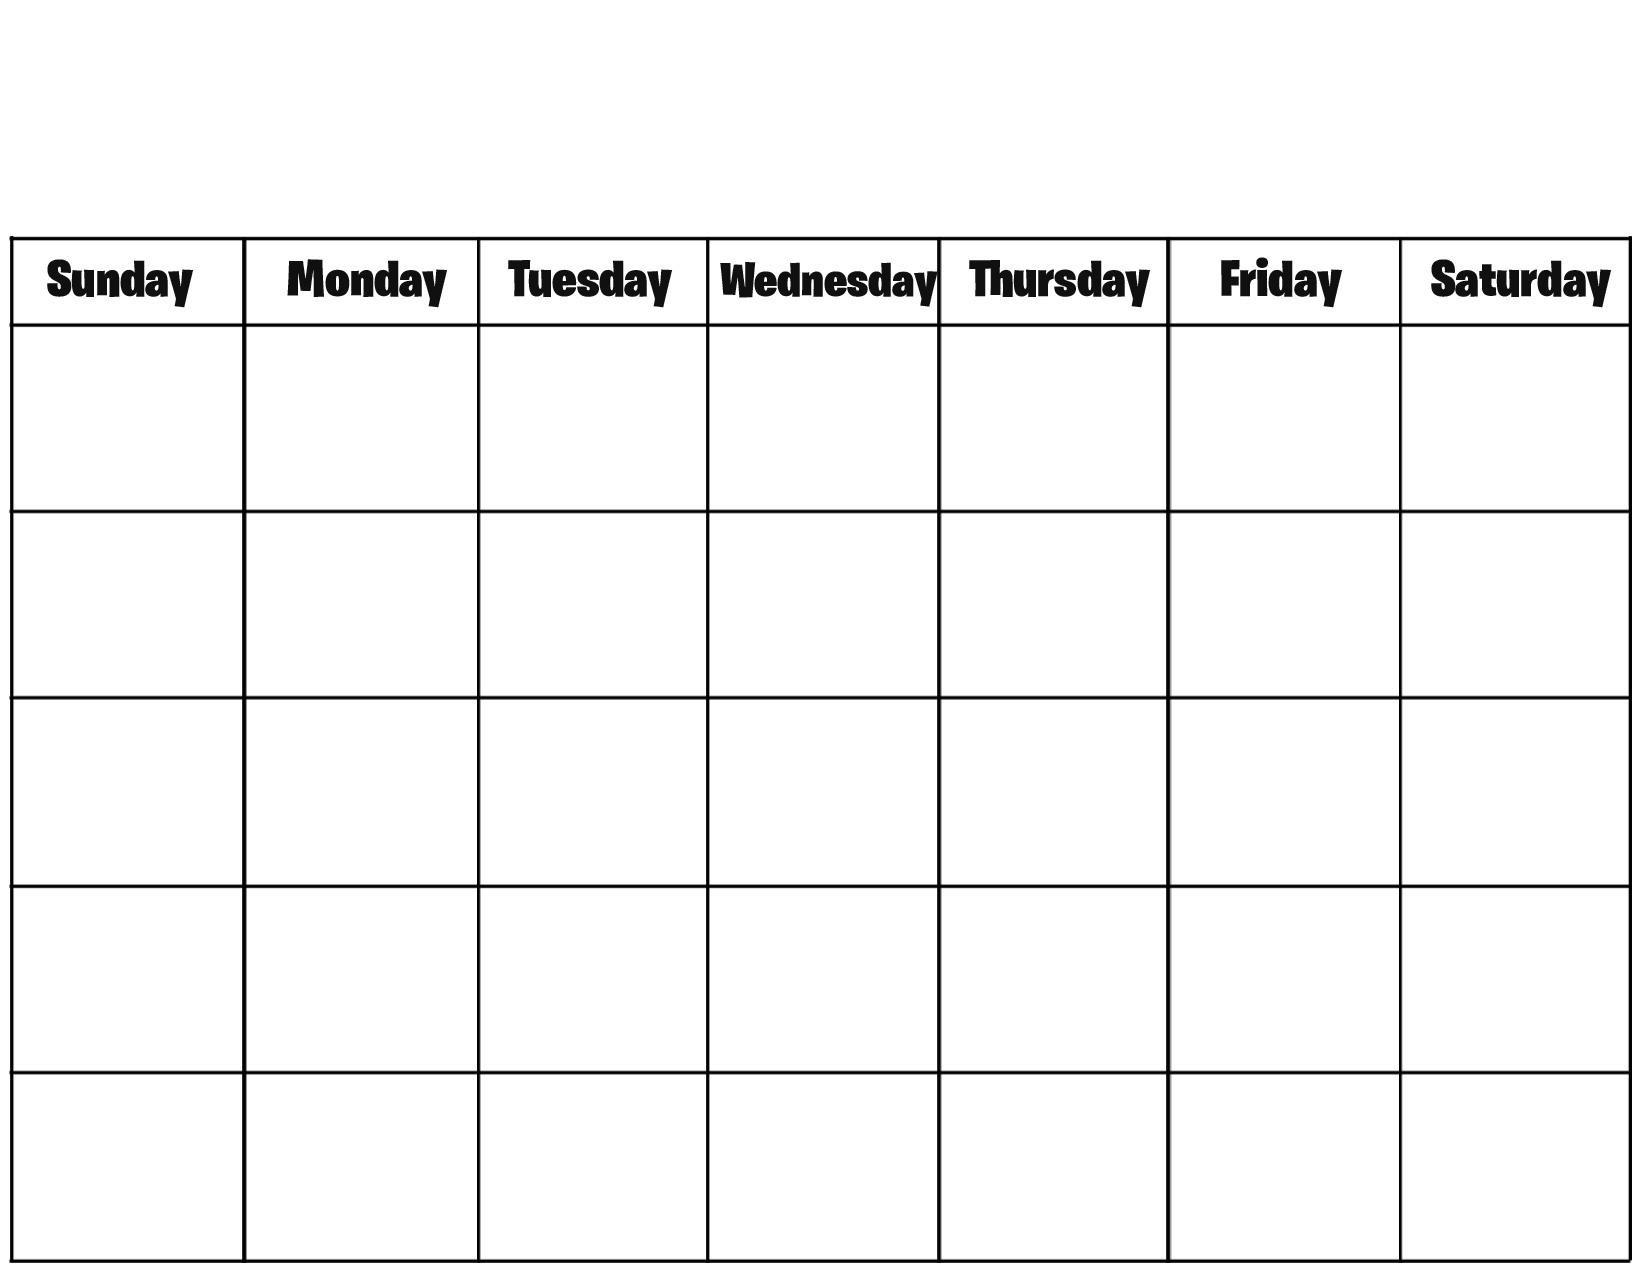 Blank Calendar Excel Template 2019 - Free Printable Calendar, Blank for Blank Printable Calendar Pages